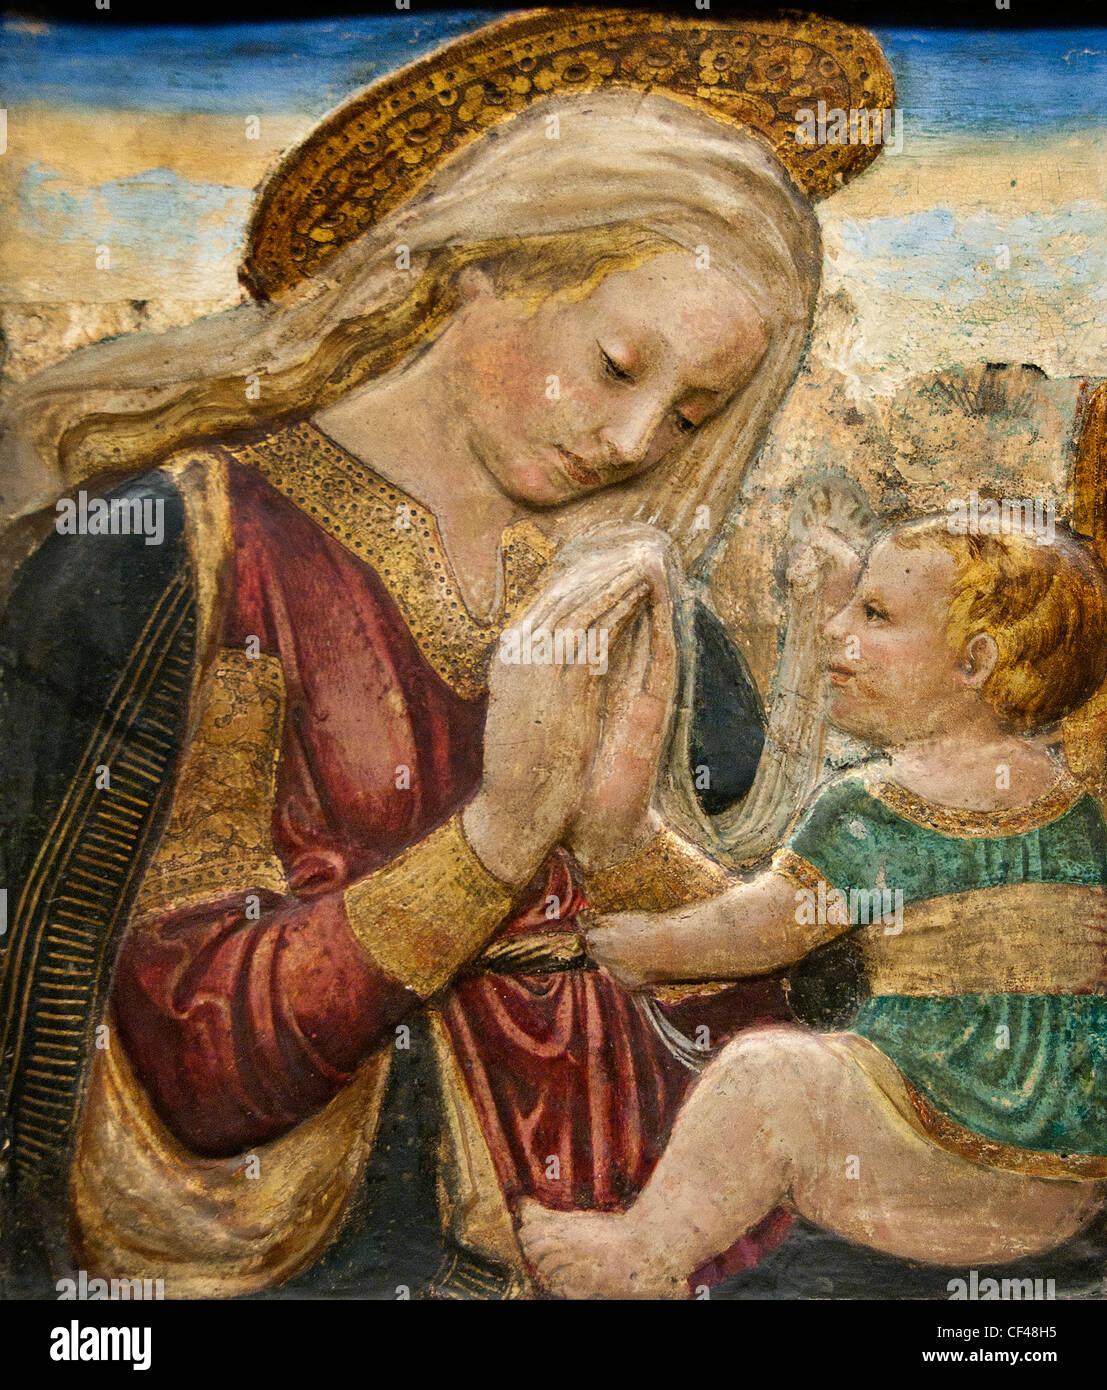 La Vierge adorant l'Enfant Jésus Christ Peinture stuc Desiderio da Settignano 1430 - 1464 1427 - Florence Photo Stock